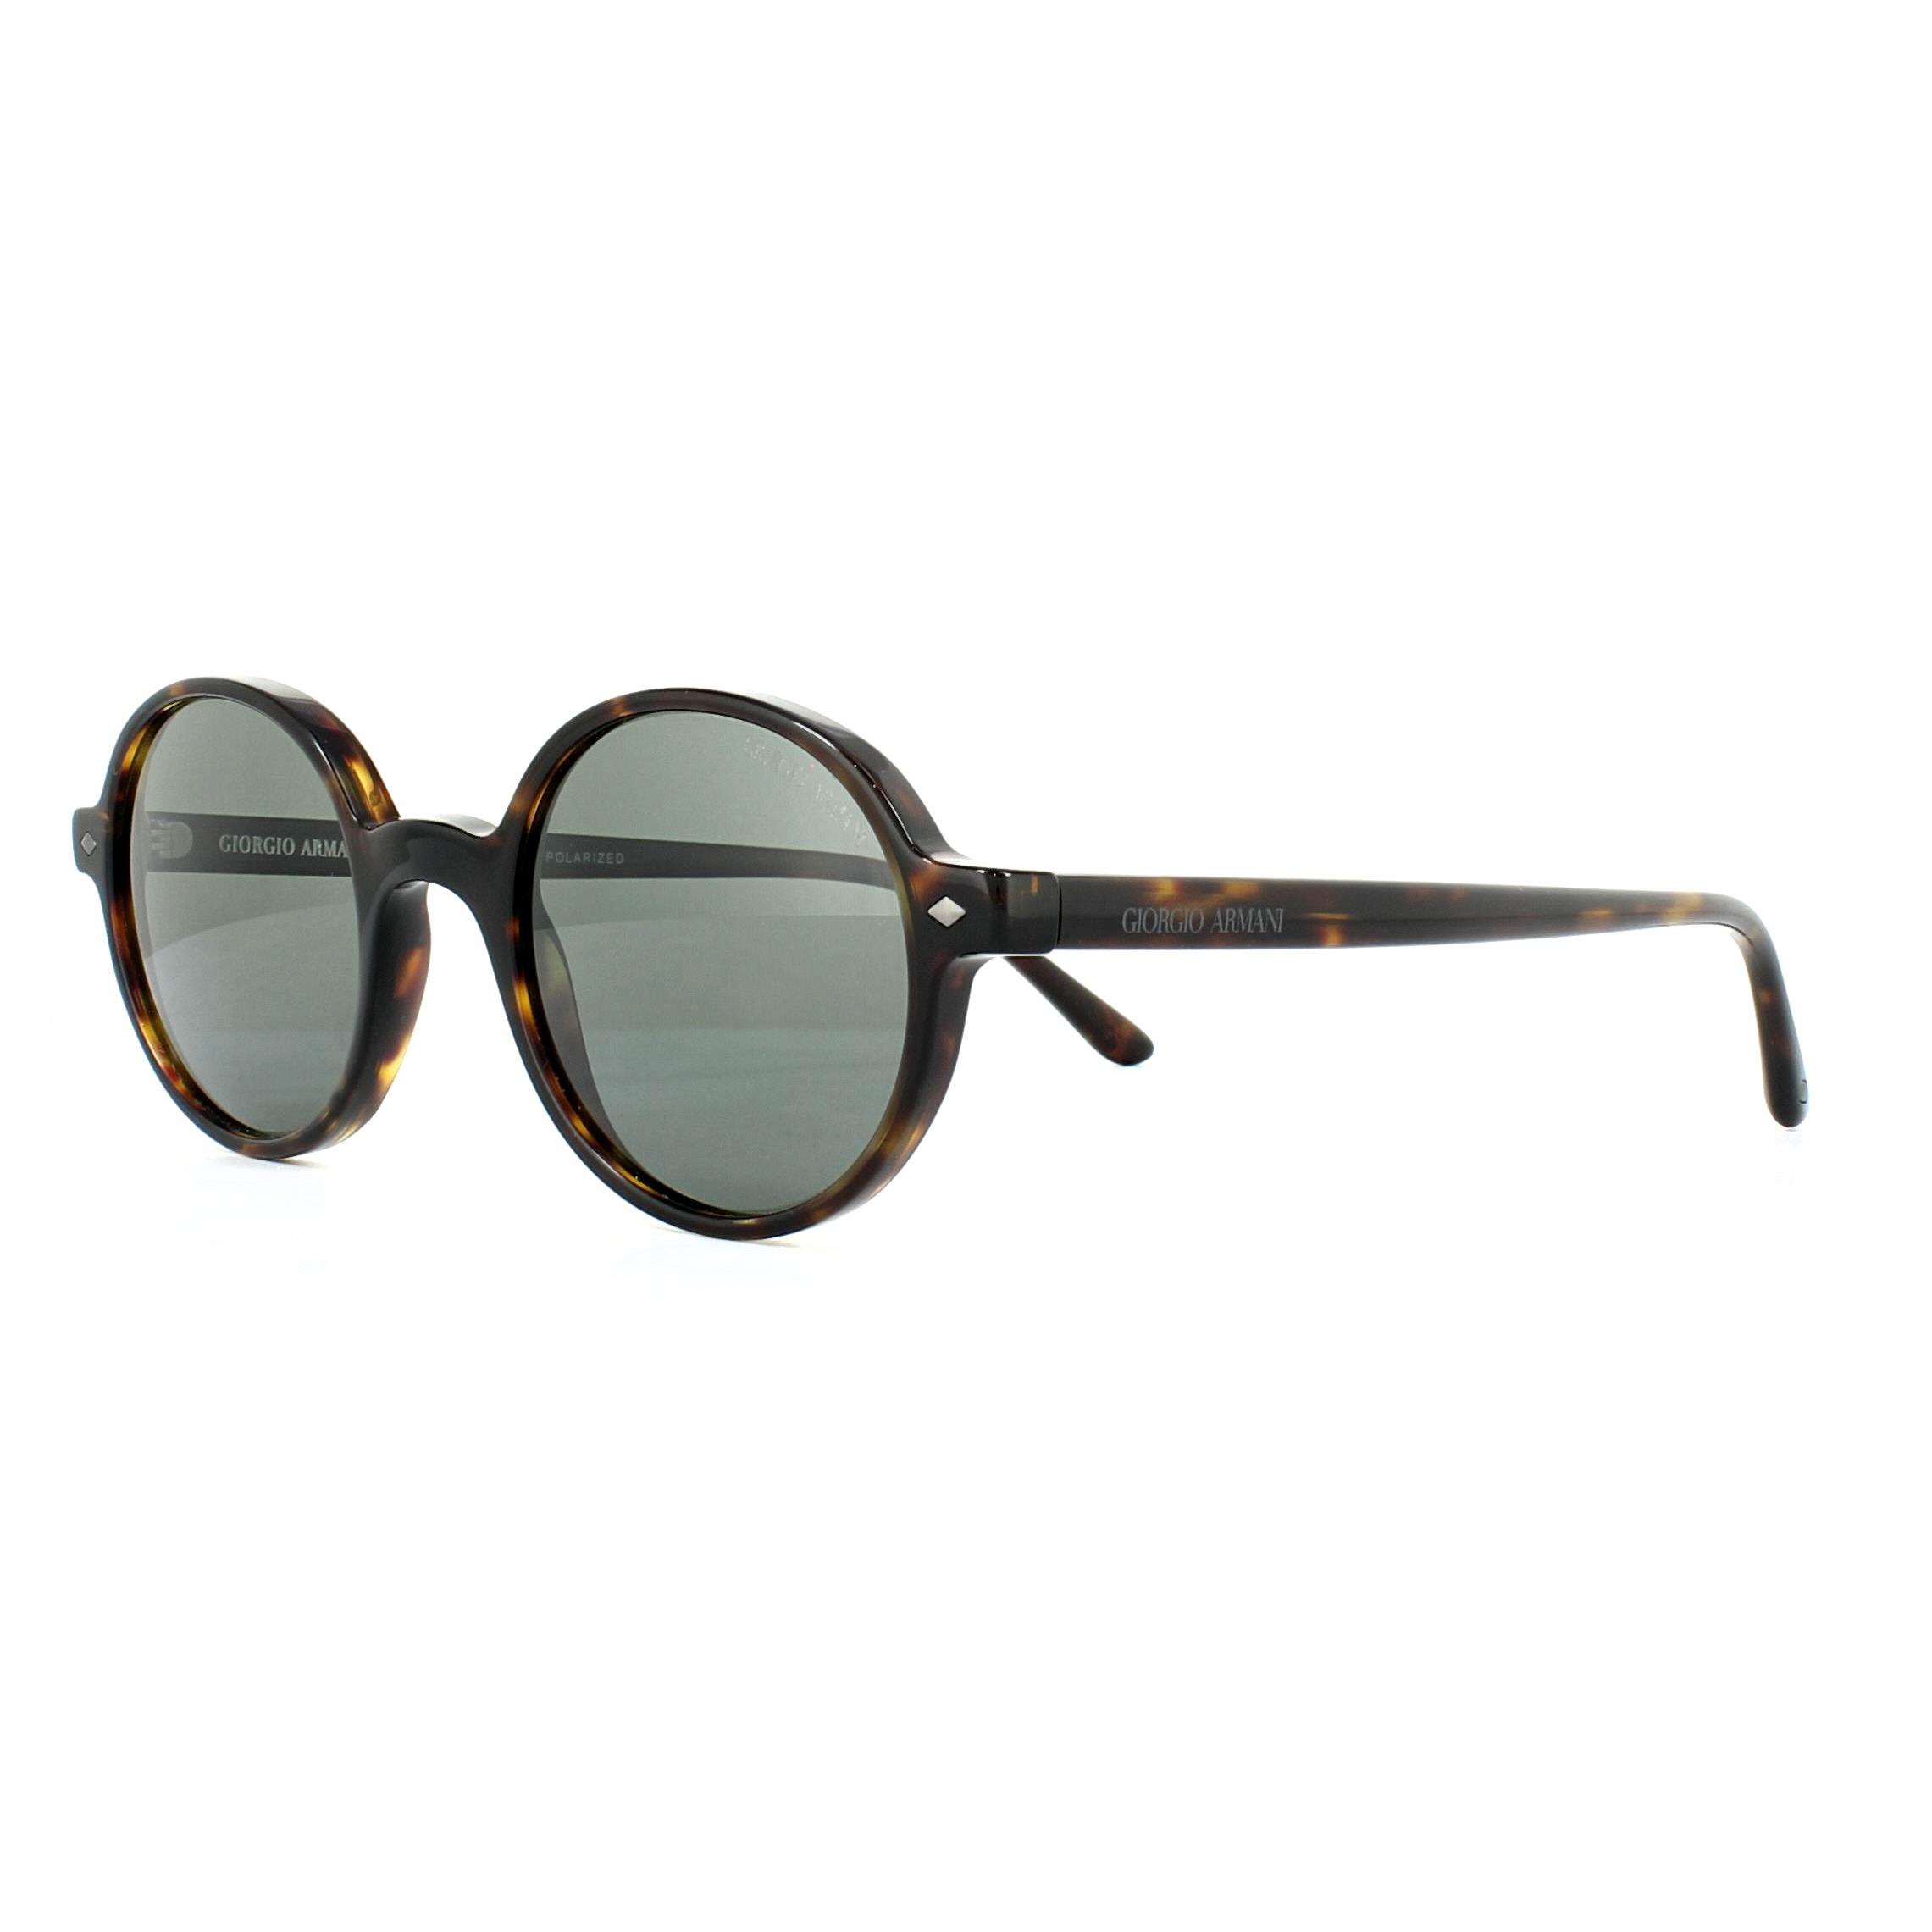 1fed3ea09869 Sentinel Giorgio Armani Sunglasses AR8097 5026K8 Havana Grey Polarized 49mm